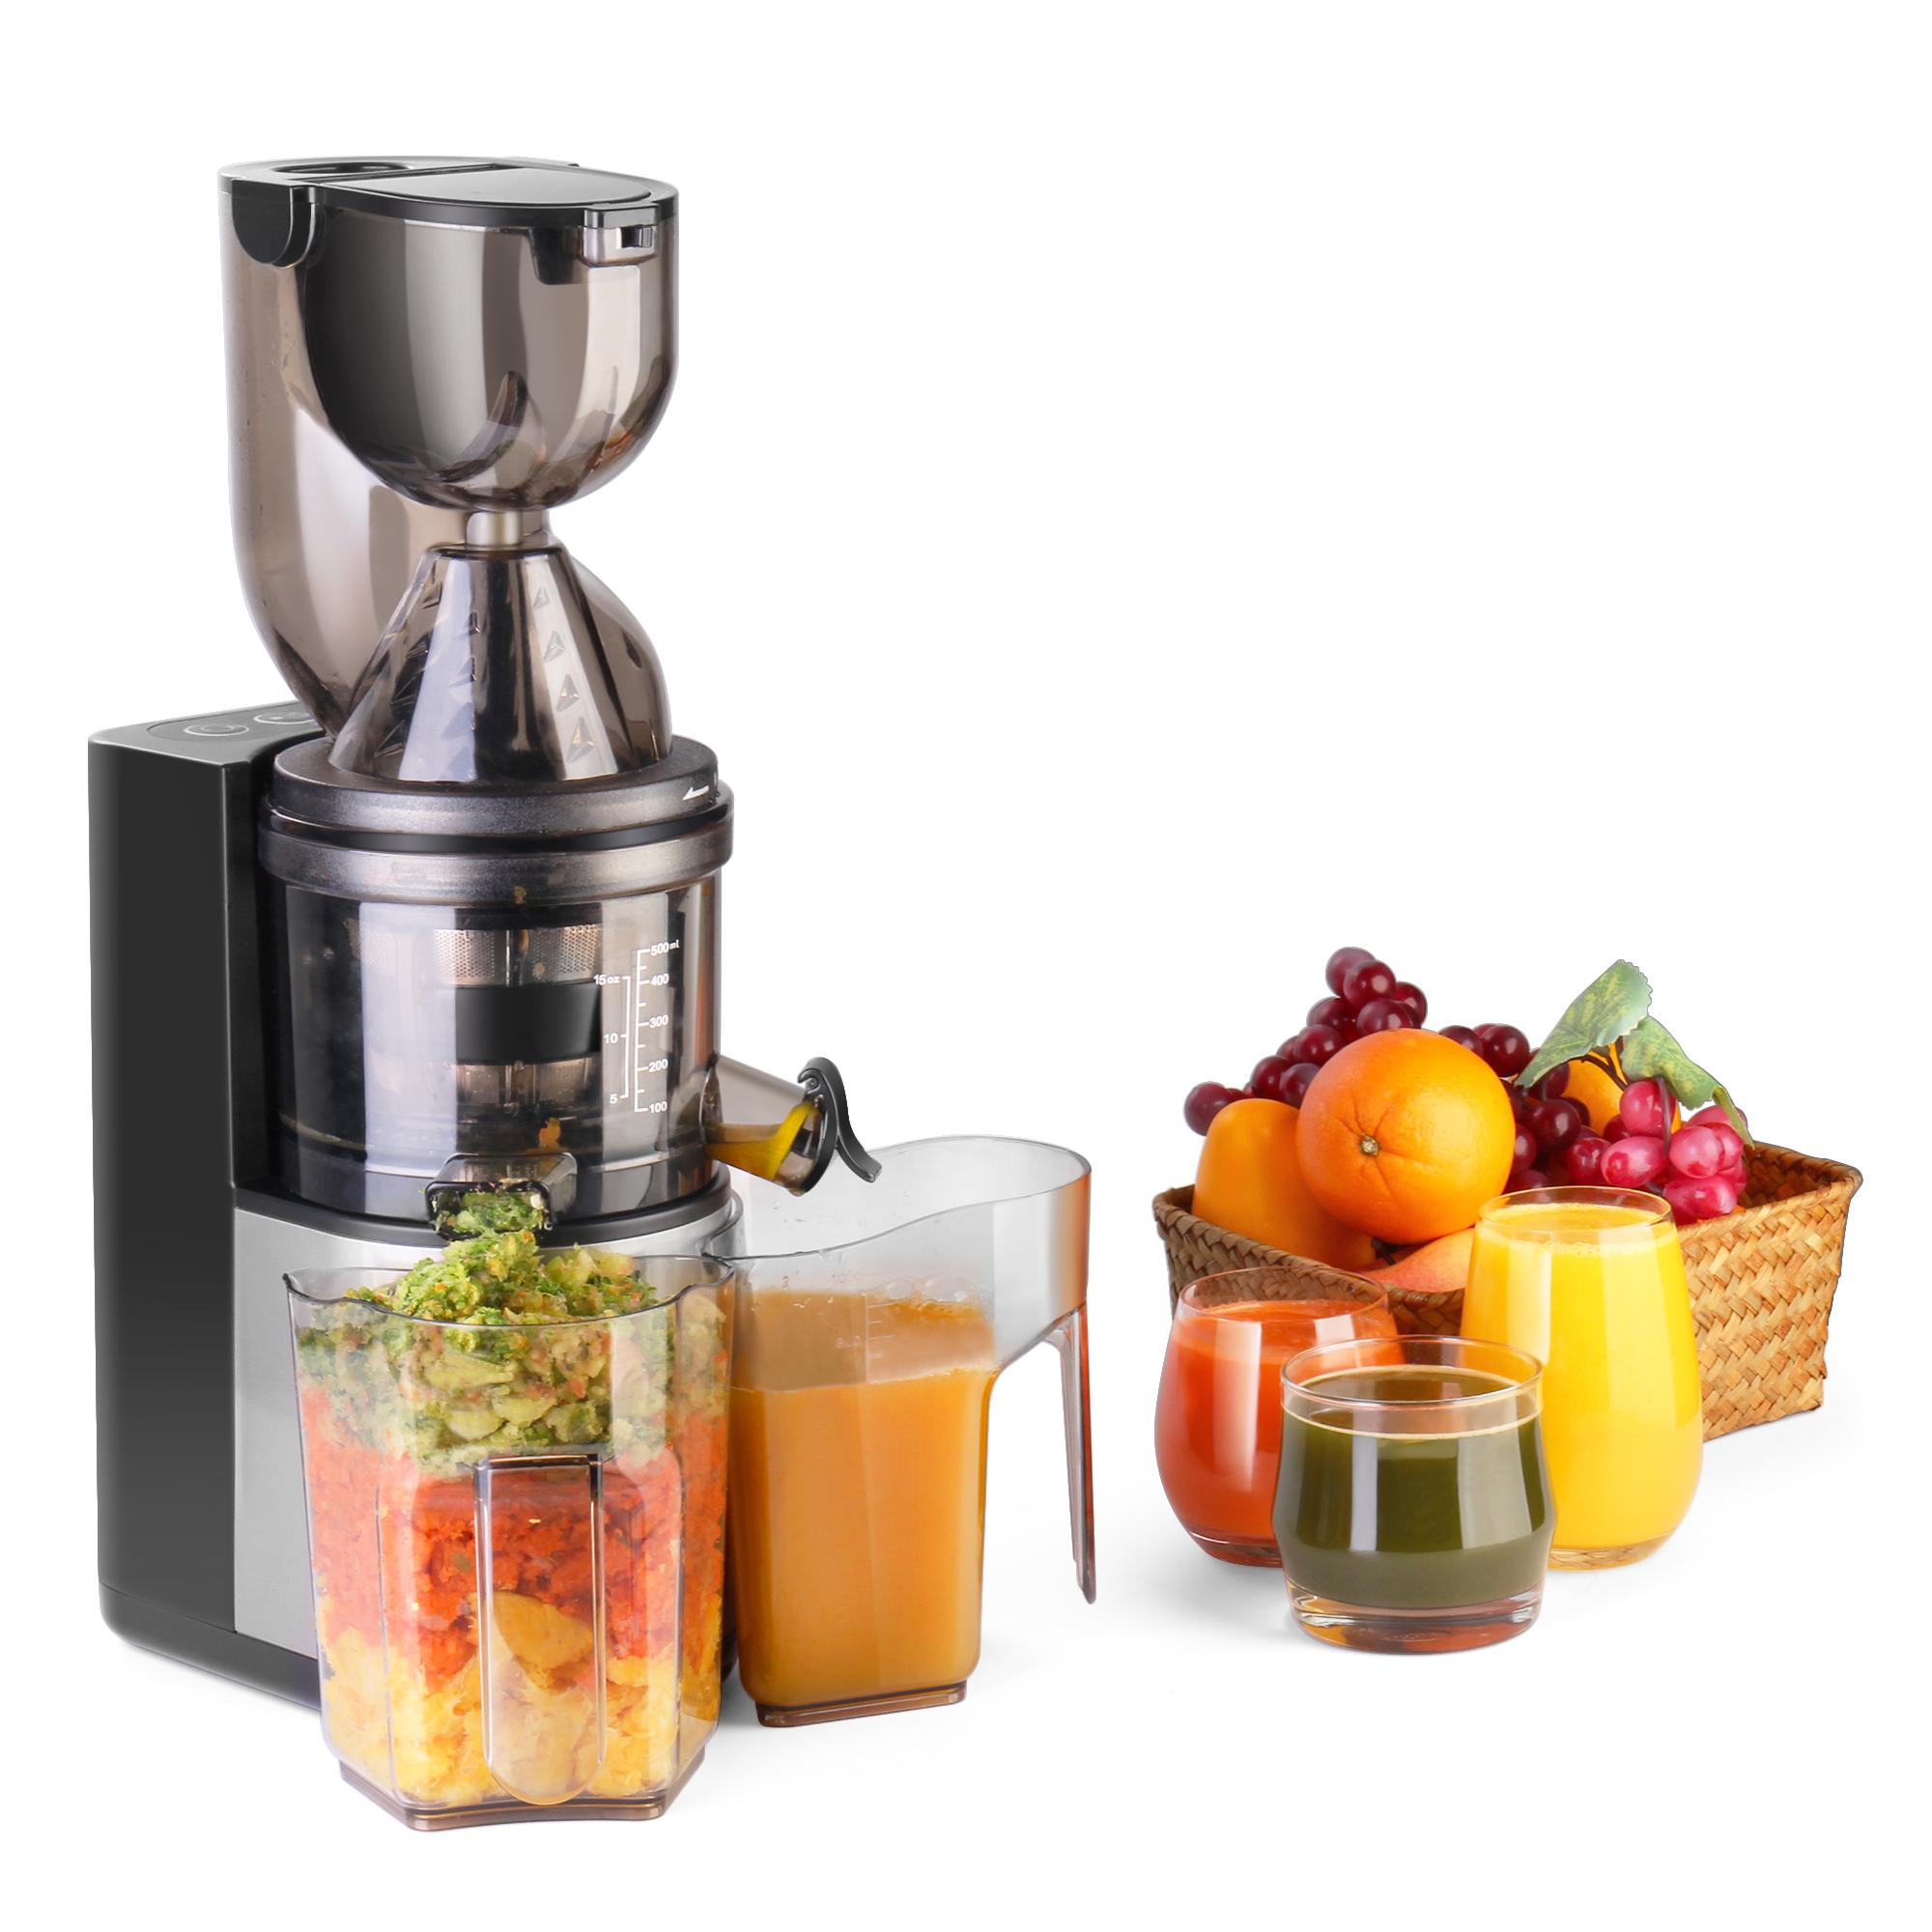 Masticating Juicer Machine - Slow Cold Press Juice Extrac...